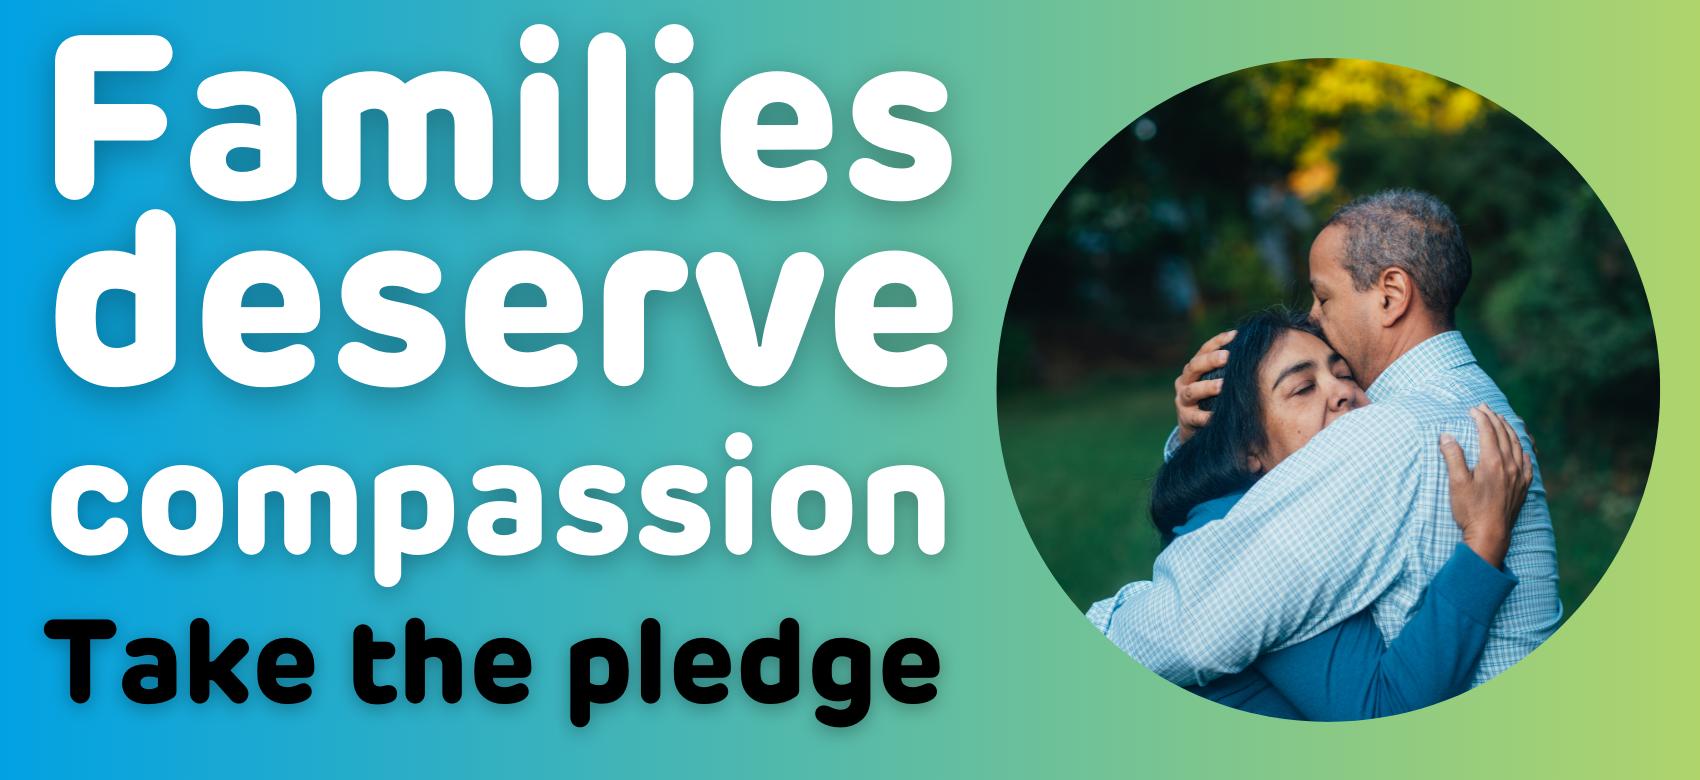 Families deserve compassion: take the pledge